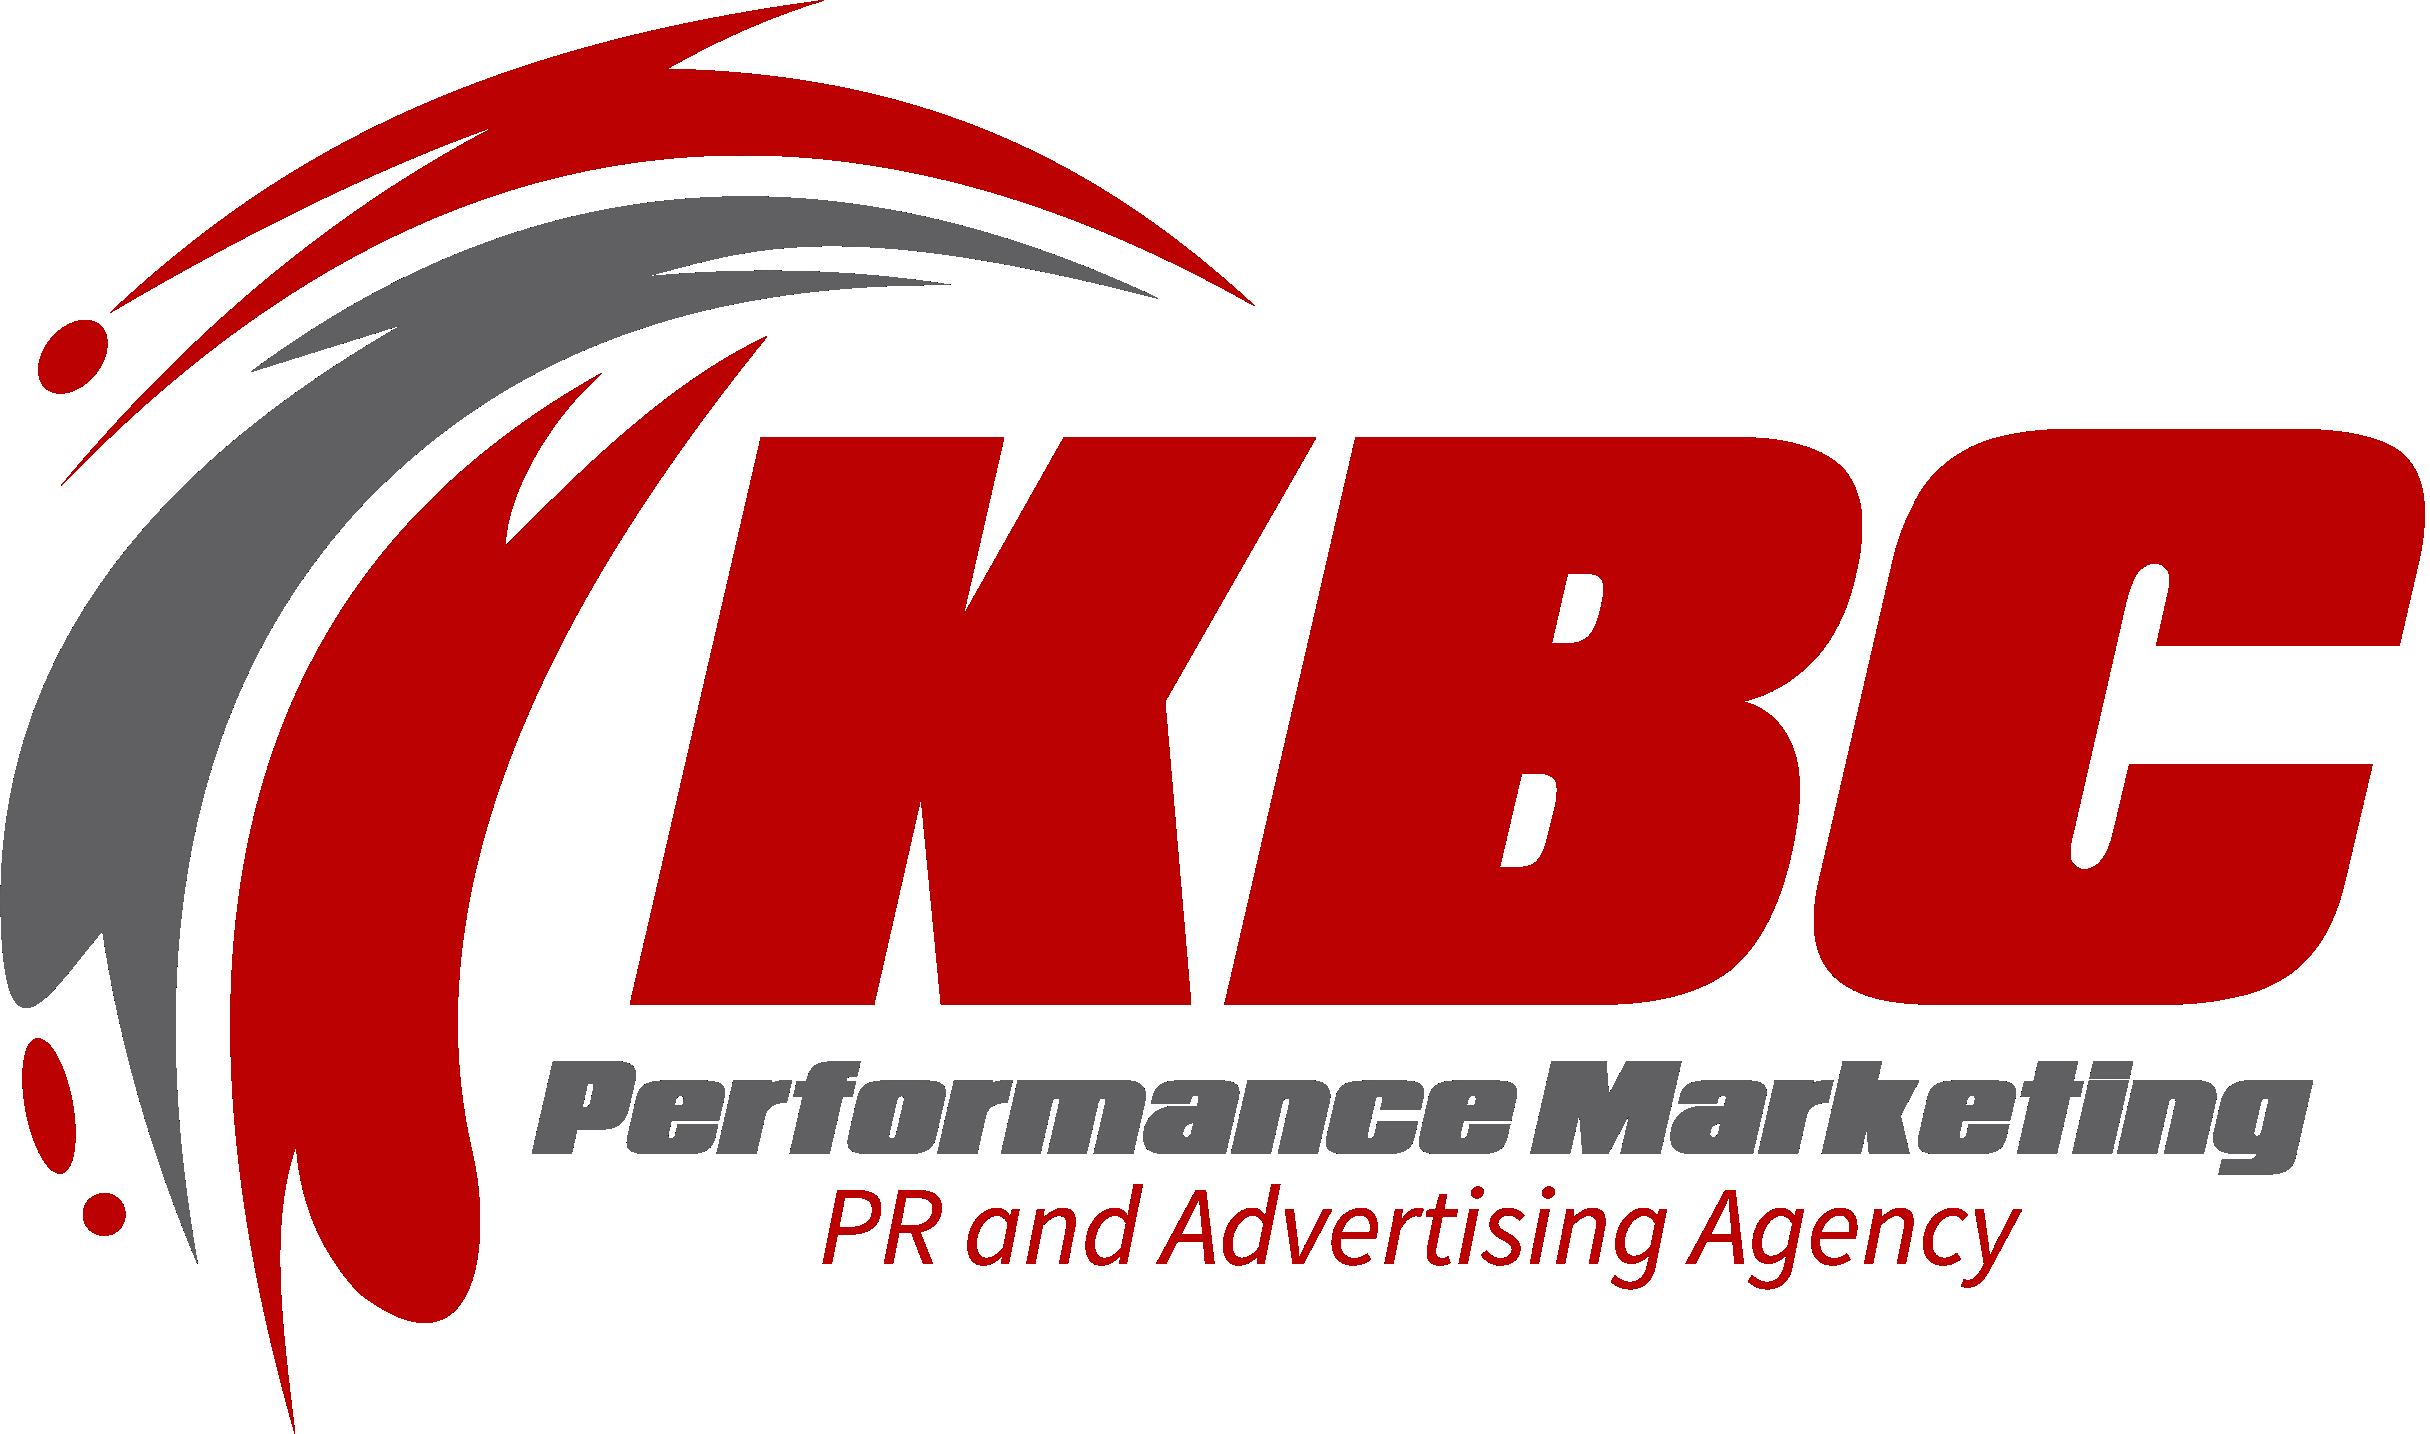 KBC Performance Marketing